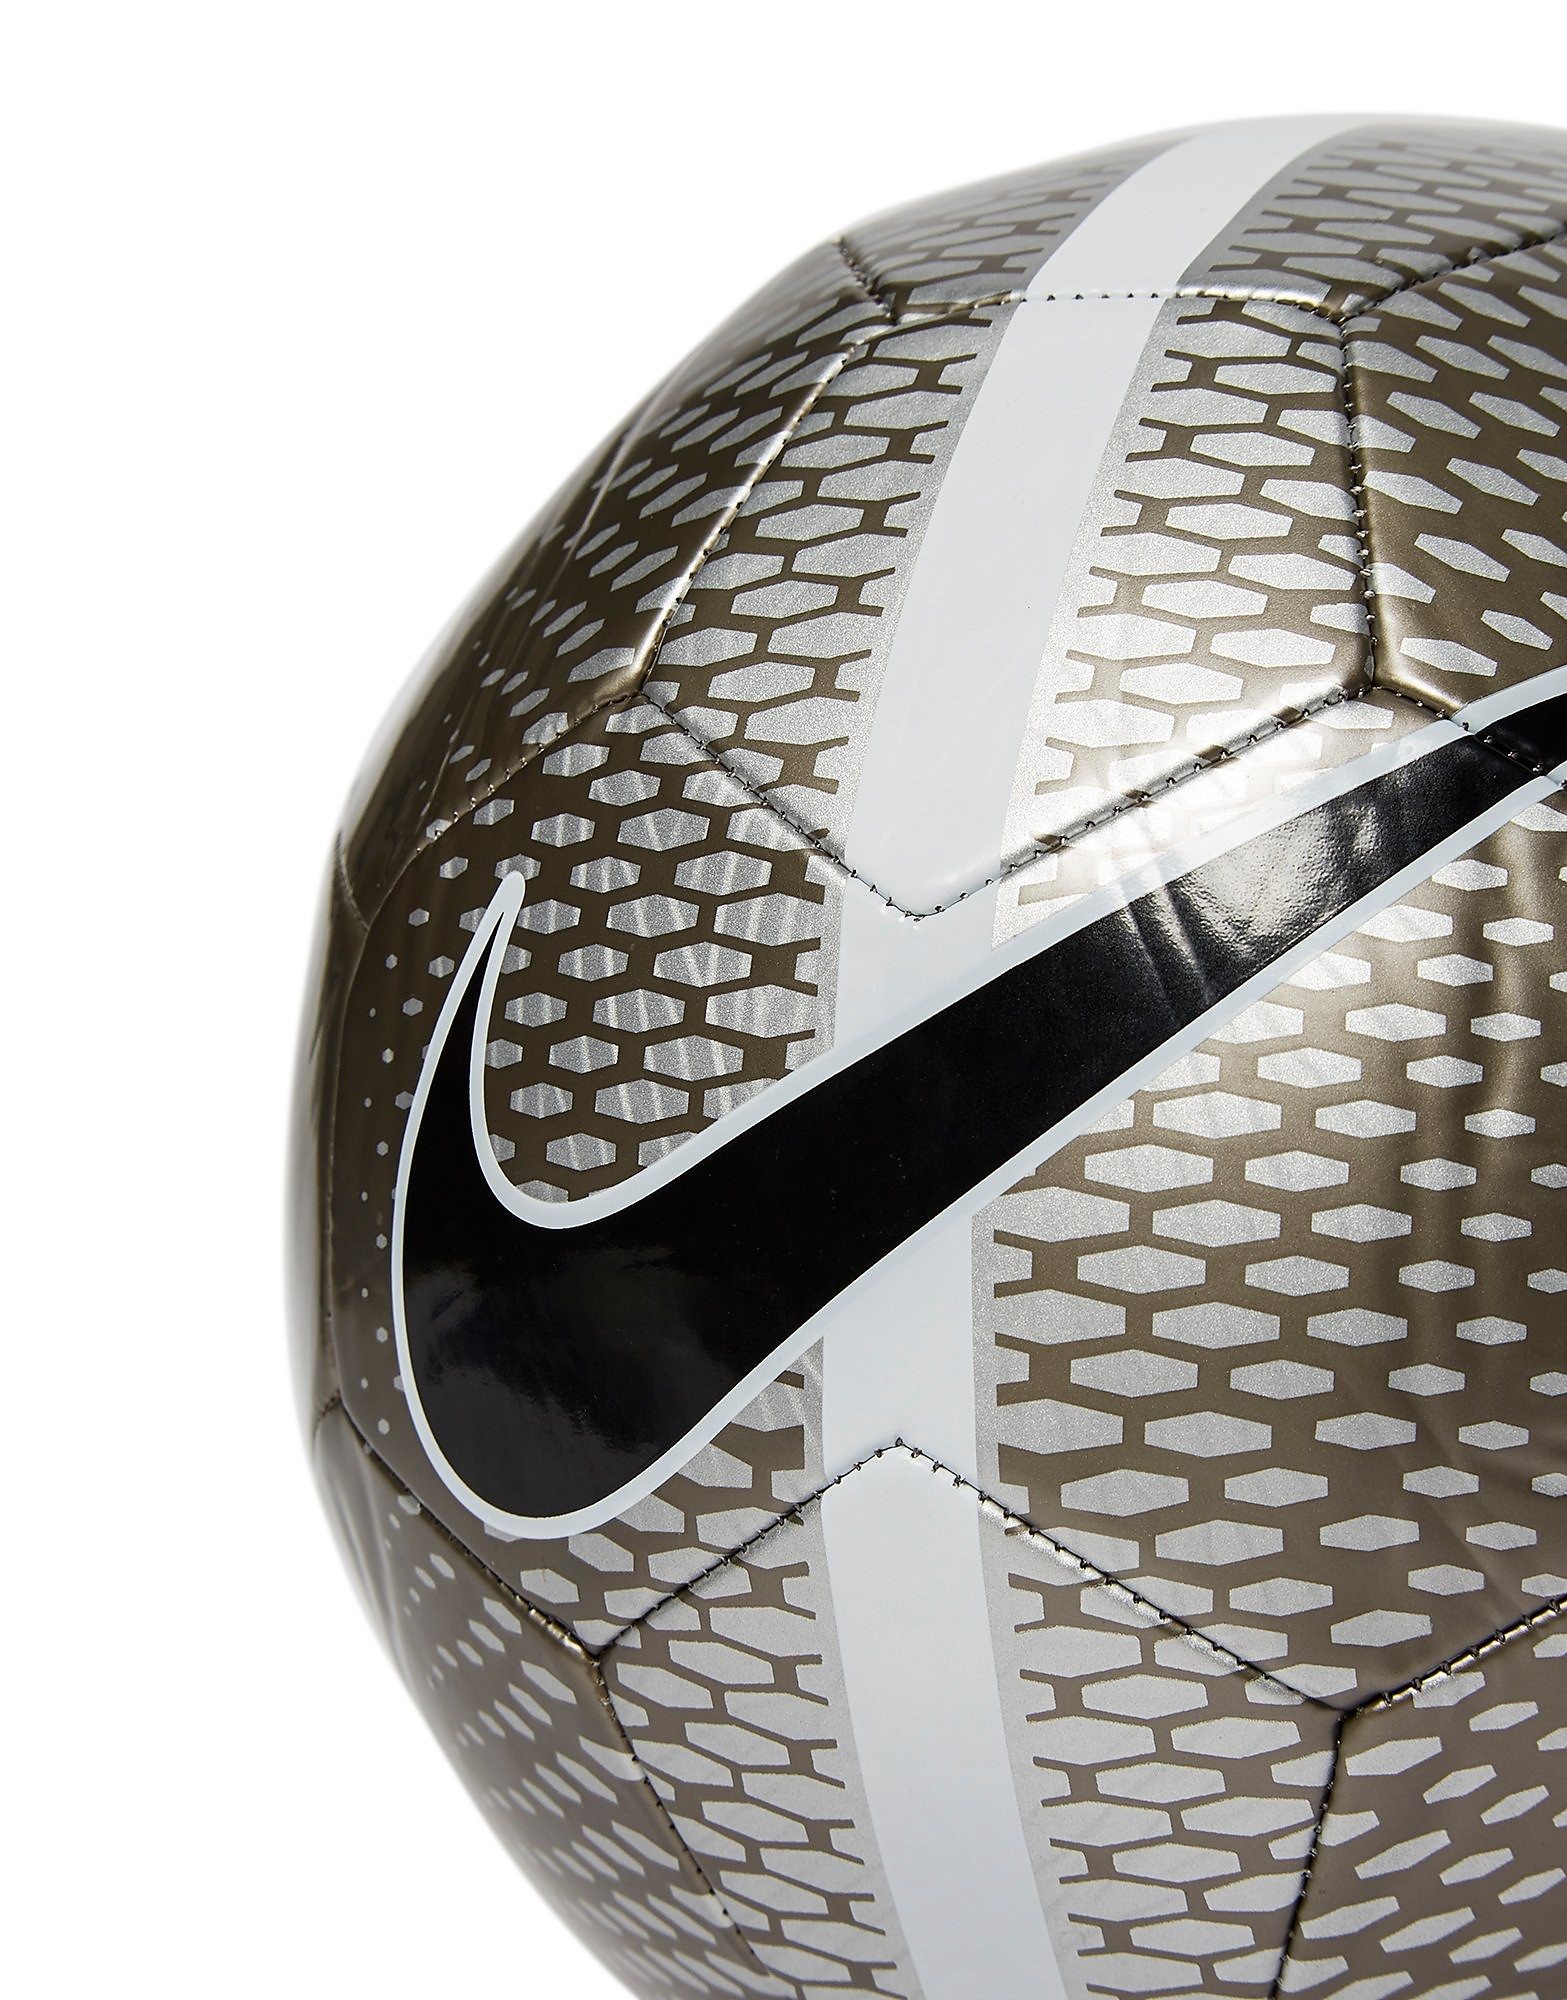 Nike Technique Football